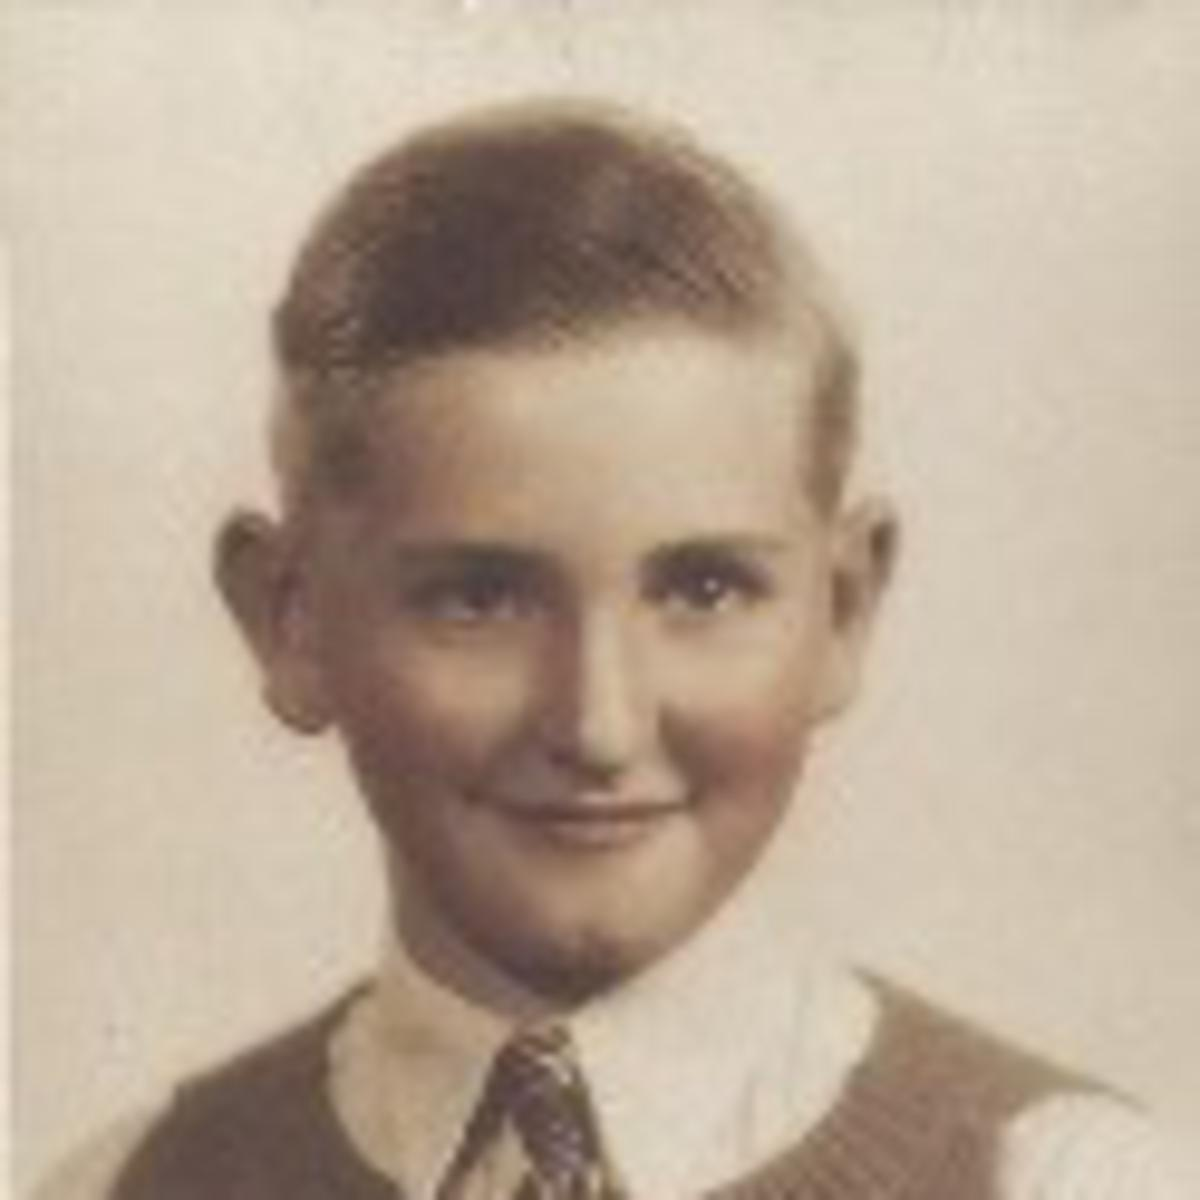 Tommy Monson lúc niên thiếu